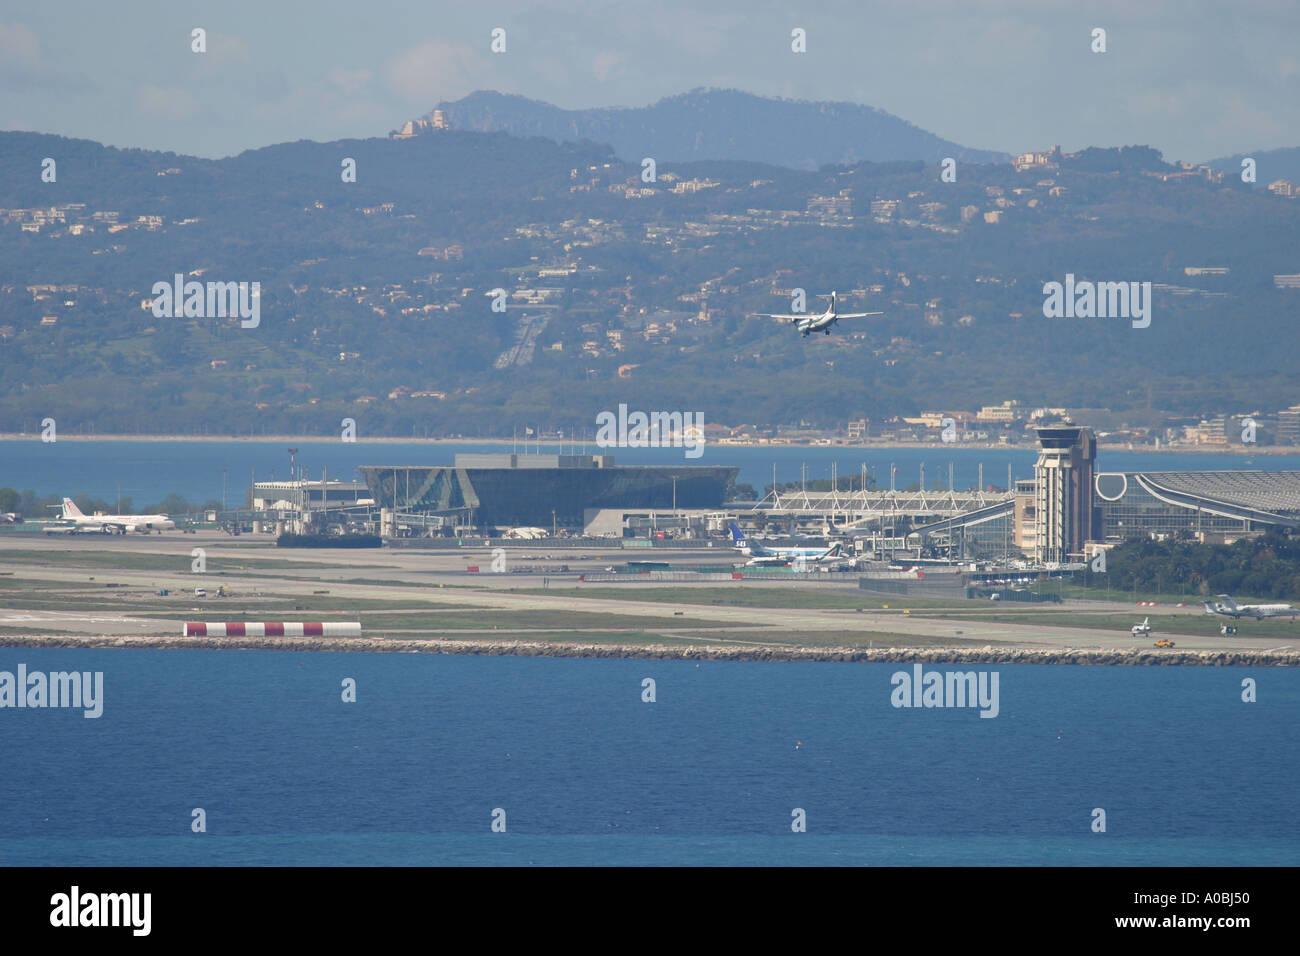 Aeroplane coming to land at Nice Airport France - Stock Image